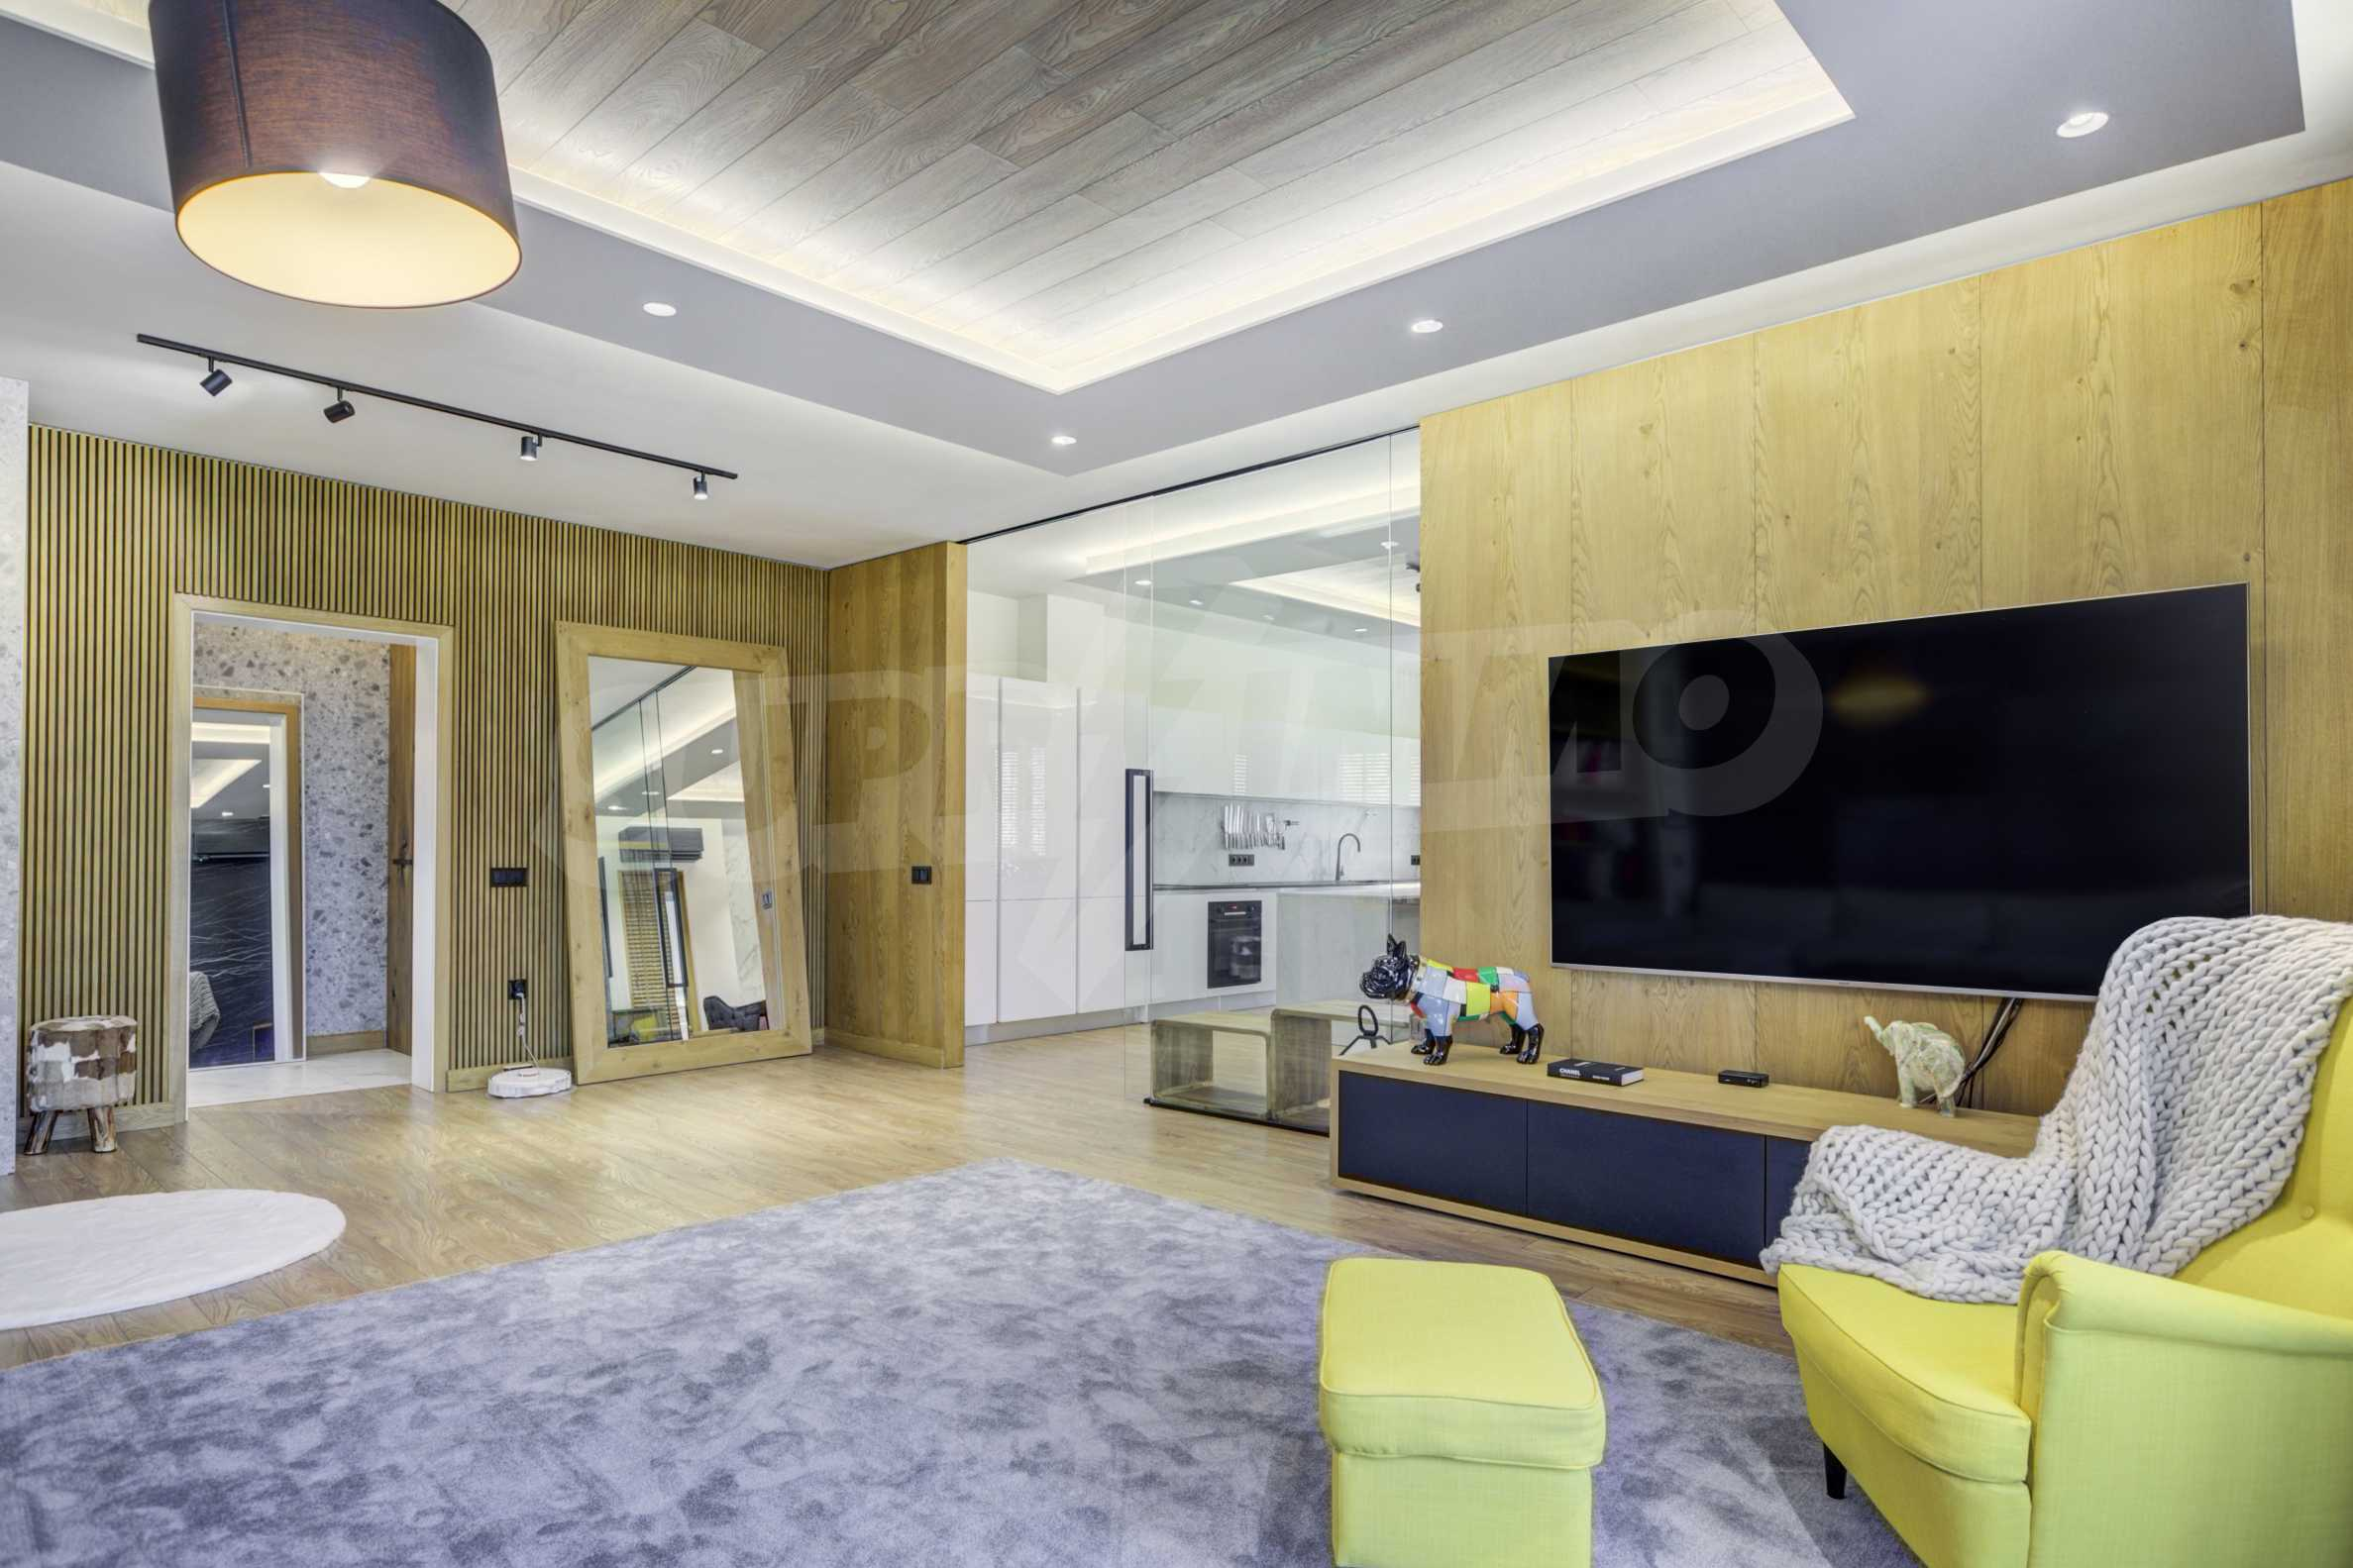 Дизайнерски обзаведен многостаен апартамент 3